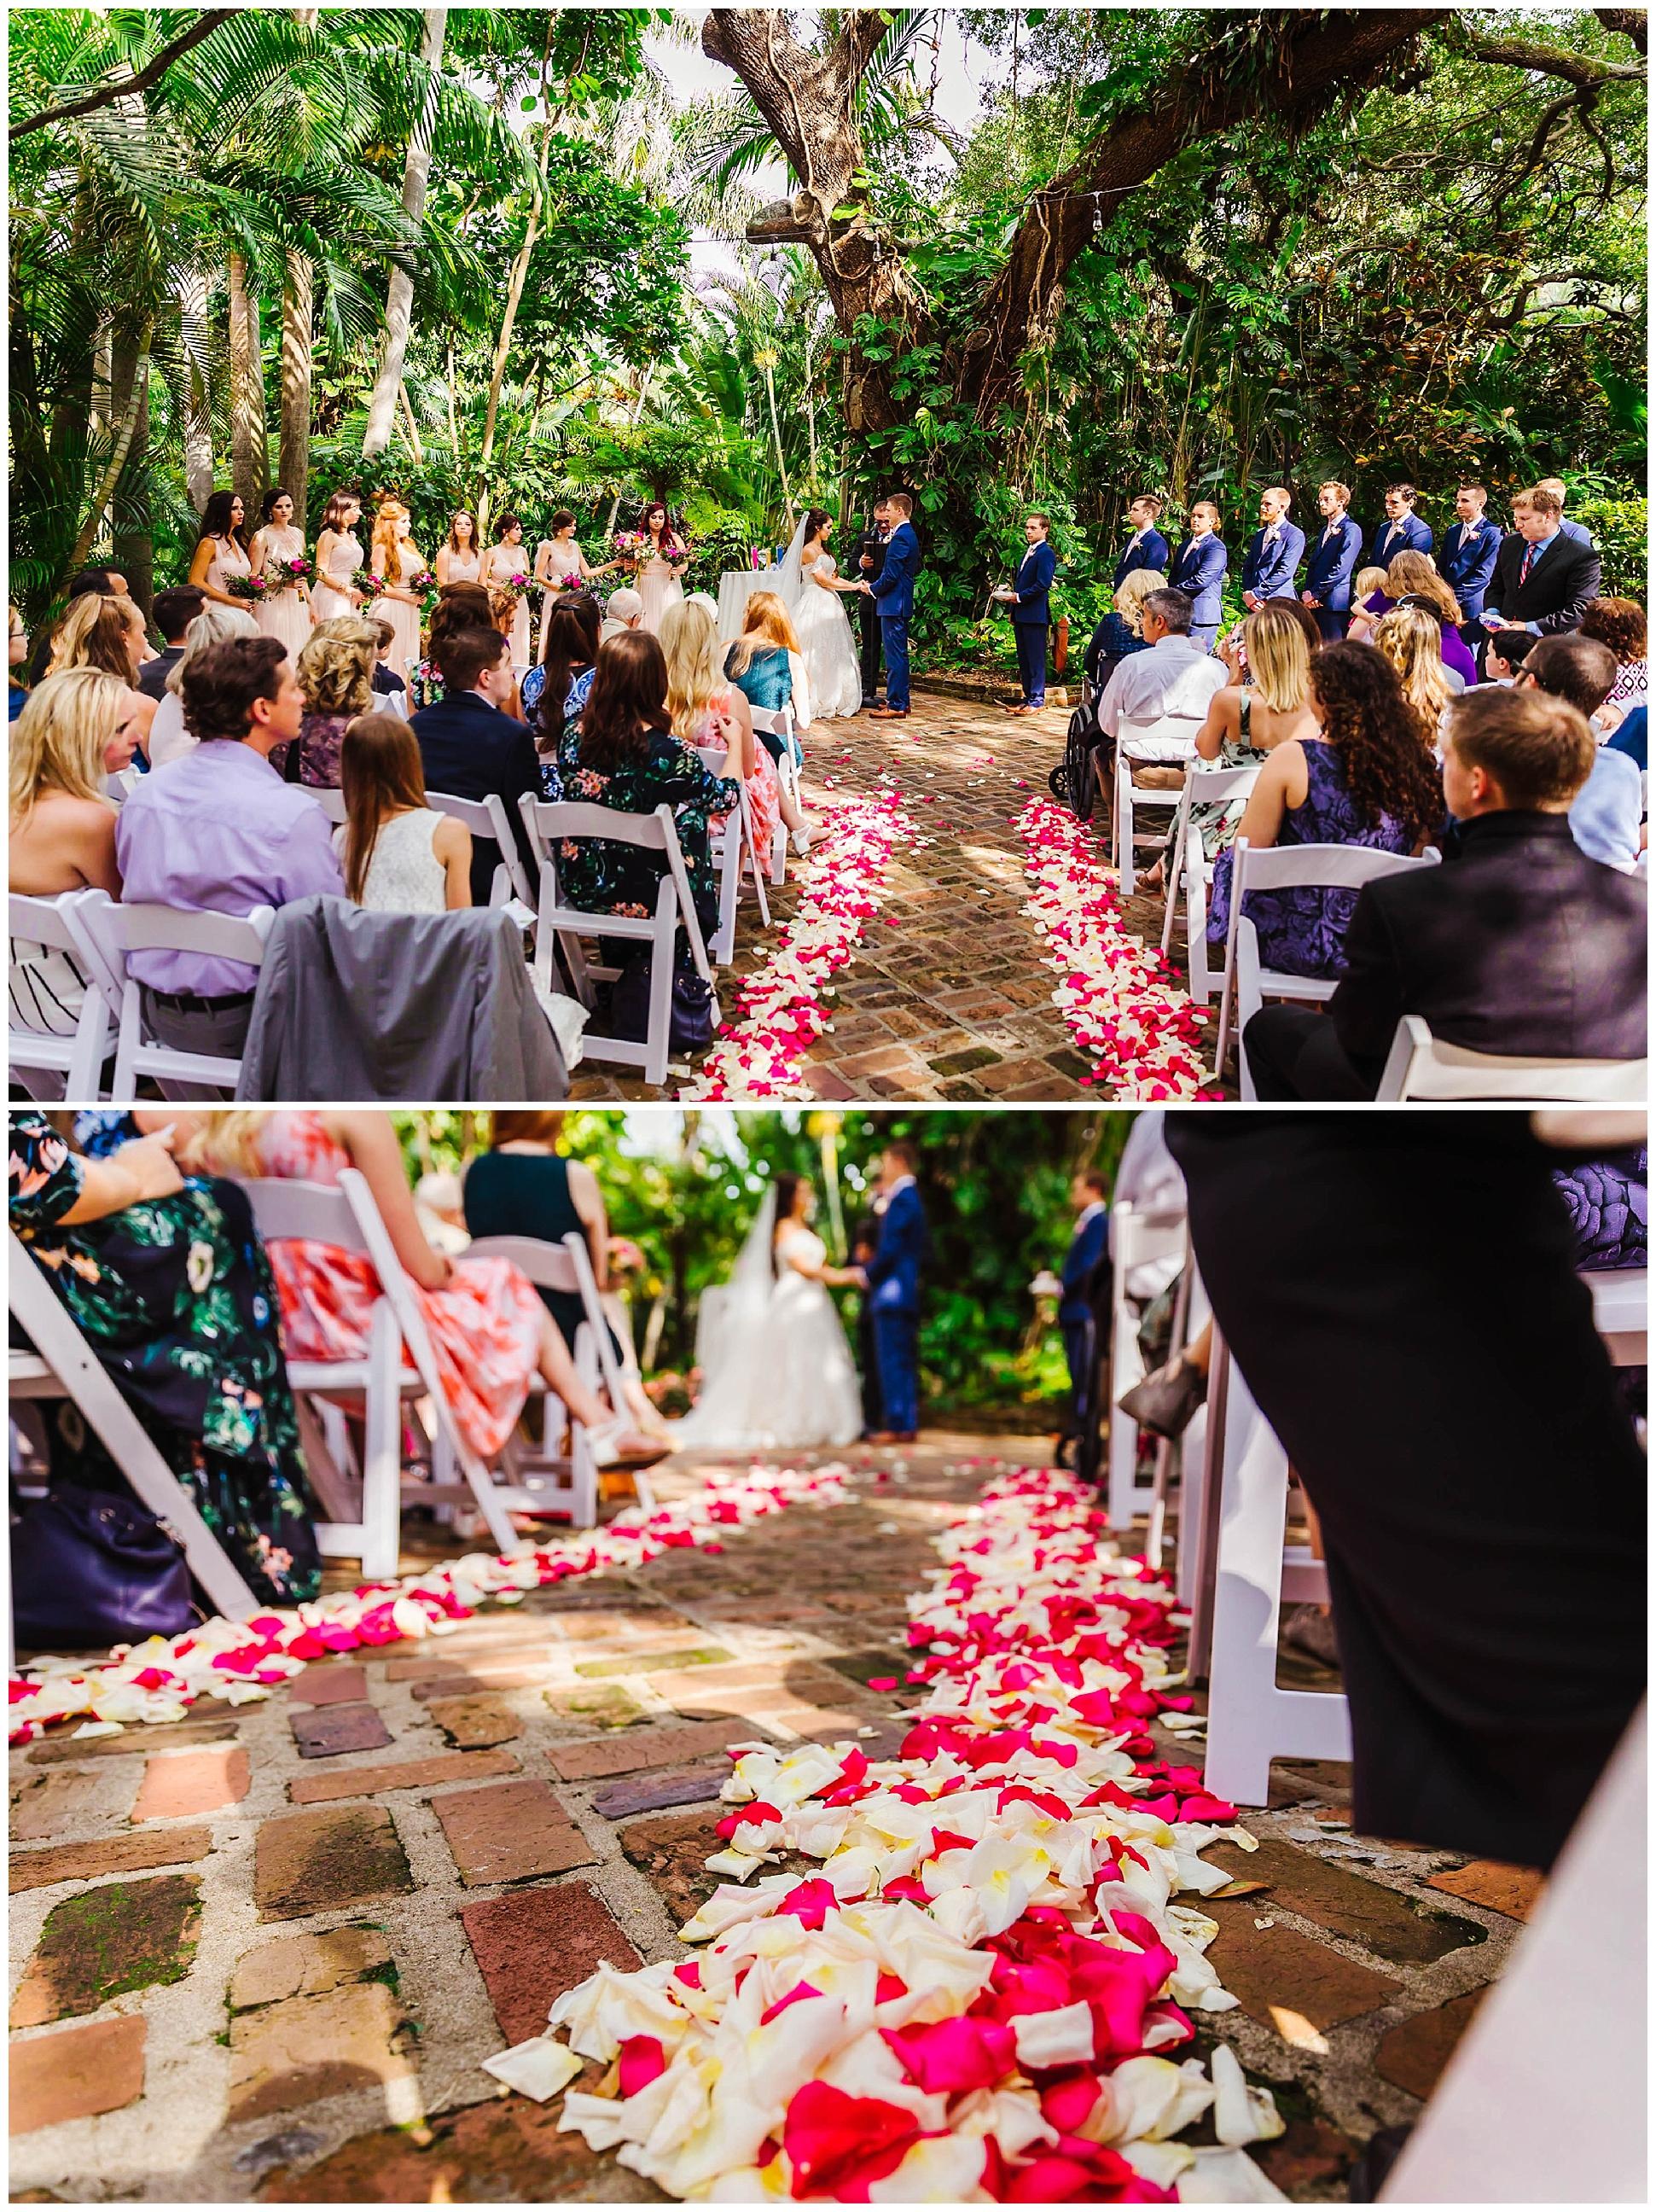 st-pete-wedding-photographer-sunken-gardens-crystal-ballroom-princess-dancer_0152.jpg